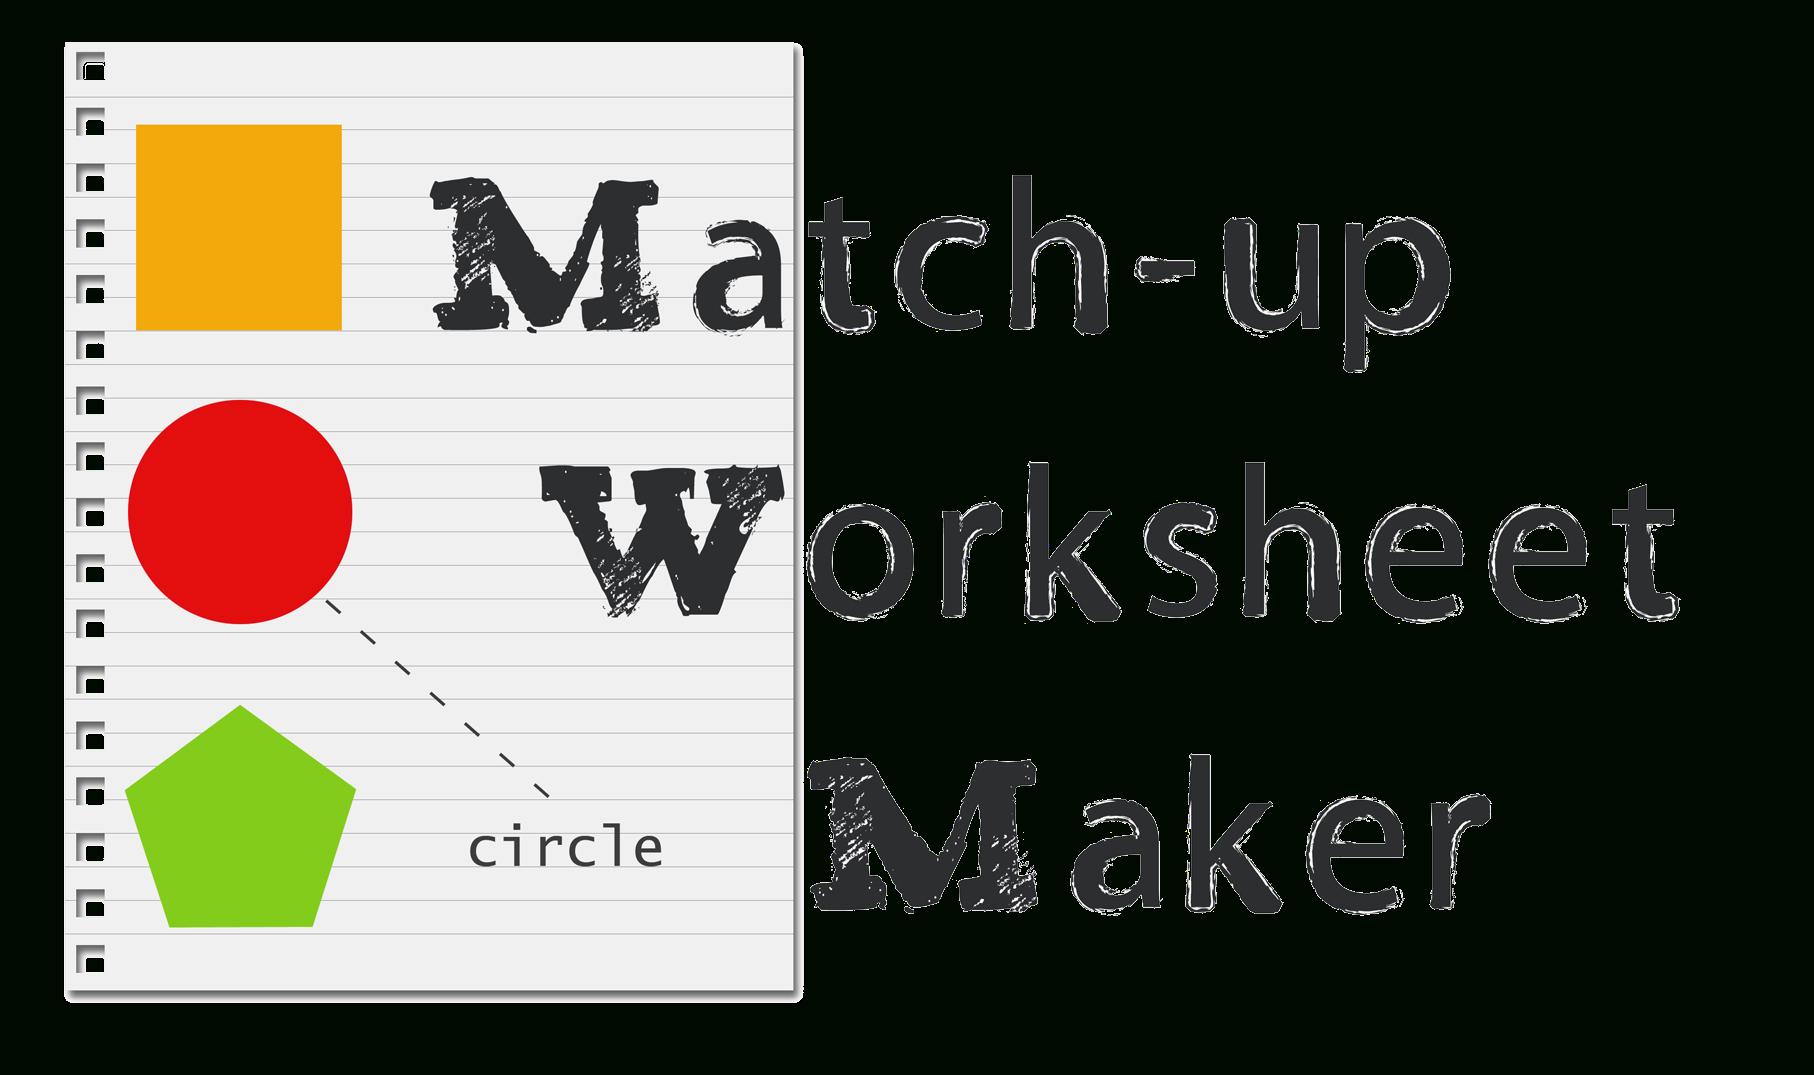 Matching Worksheet Maker: Create Custom Printable Worksheets - Make | Printable Worksheet Maker